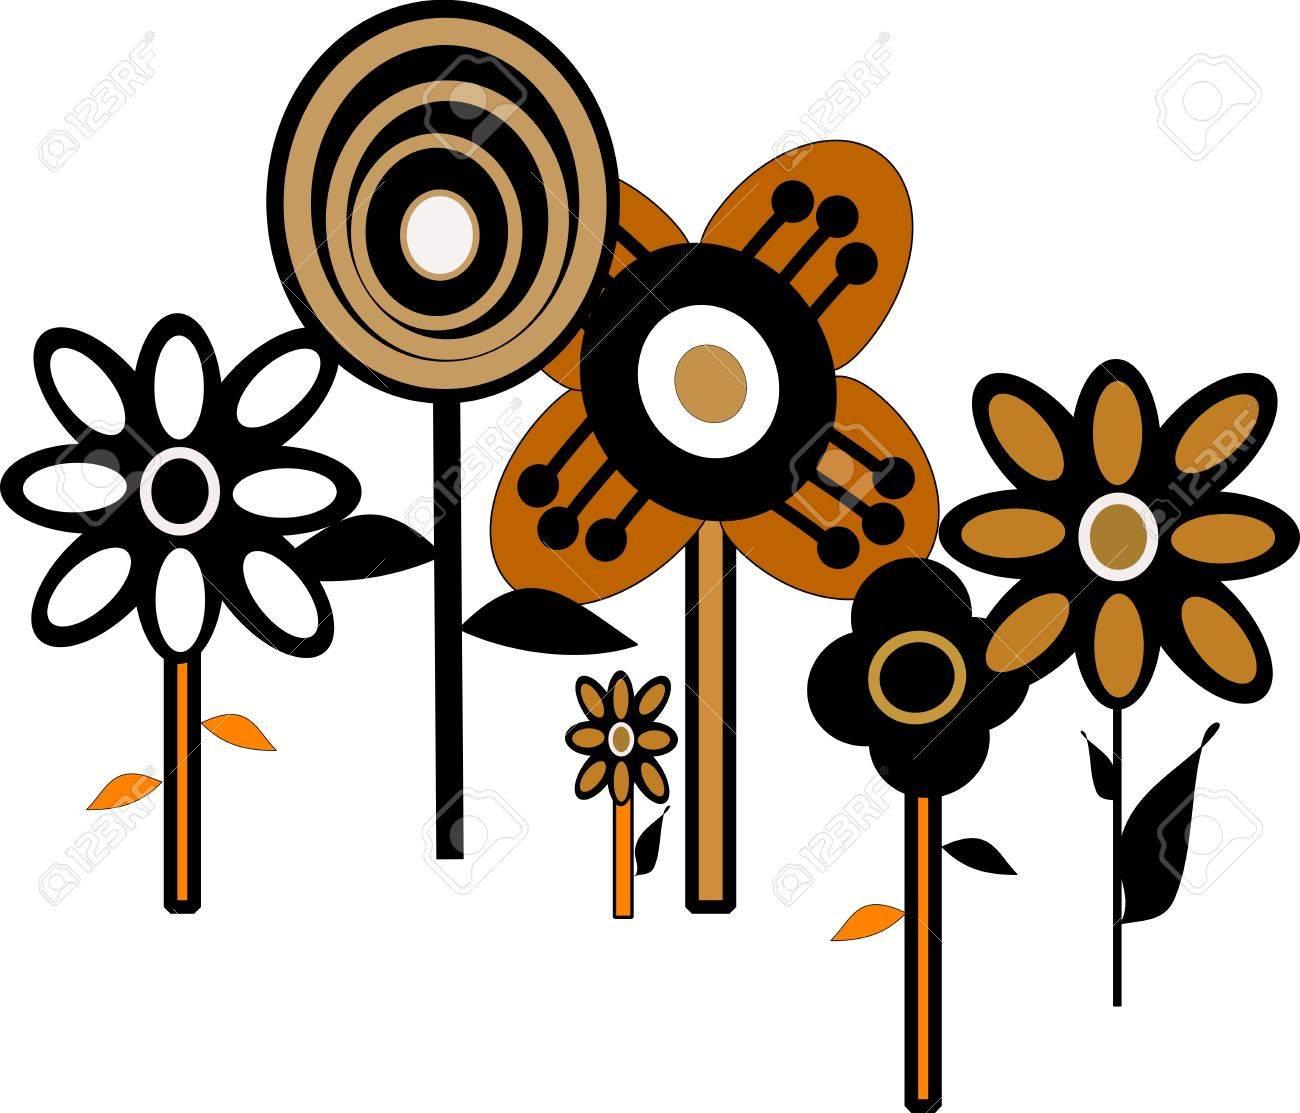 sixties flower pattern wallpaper Stock Vector - 12783967